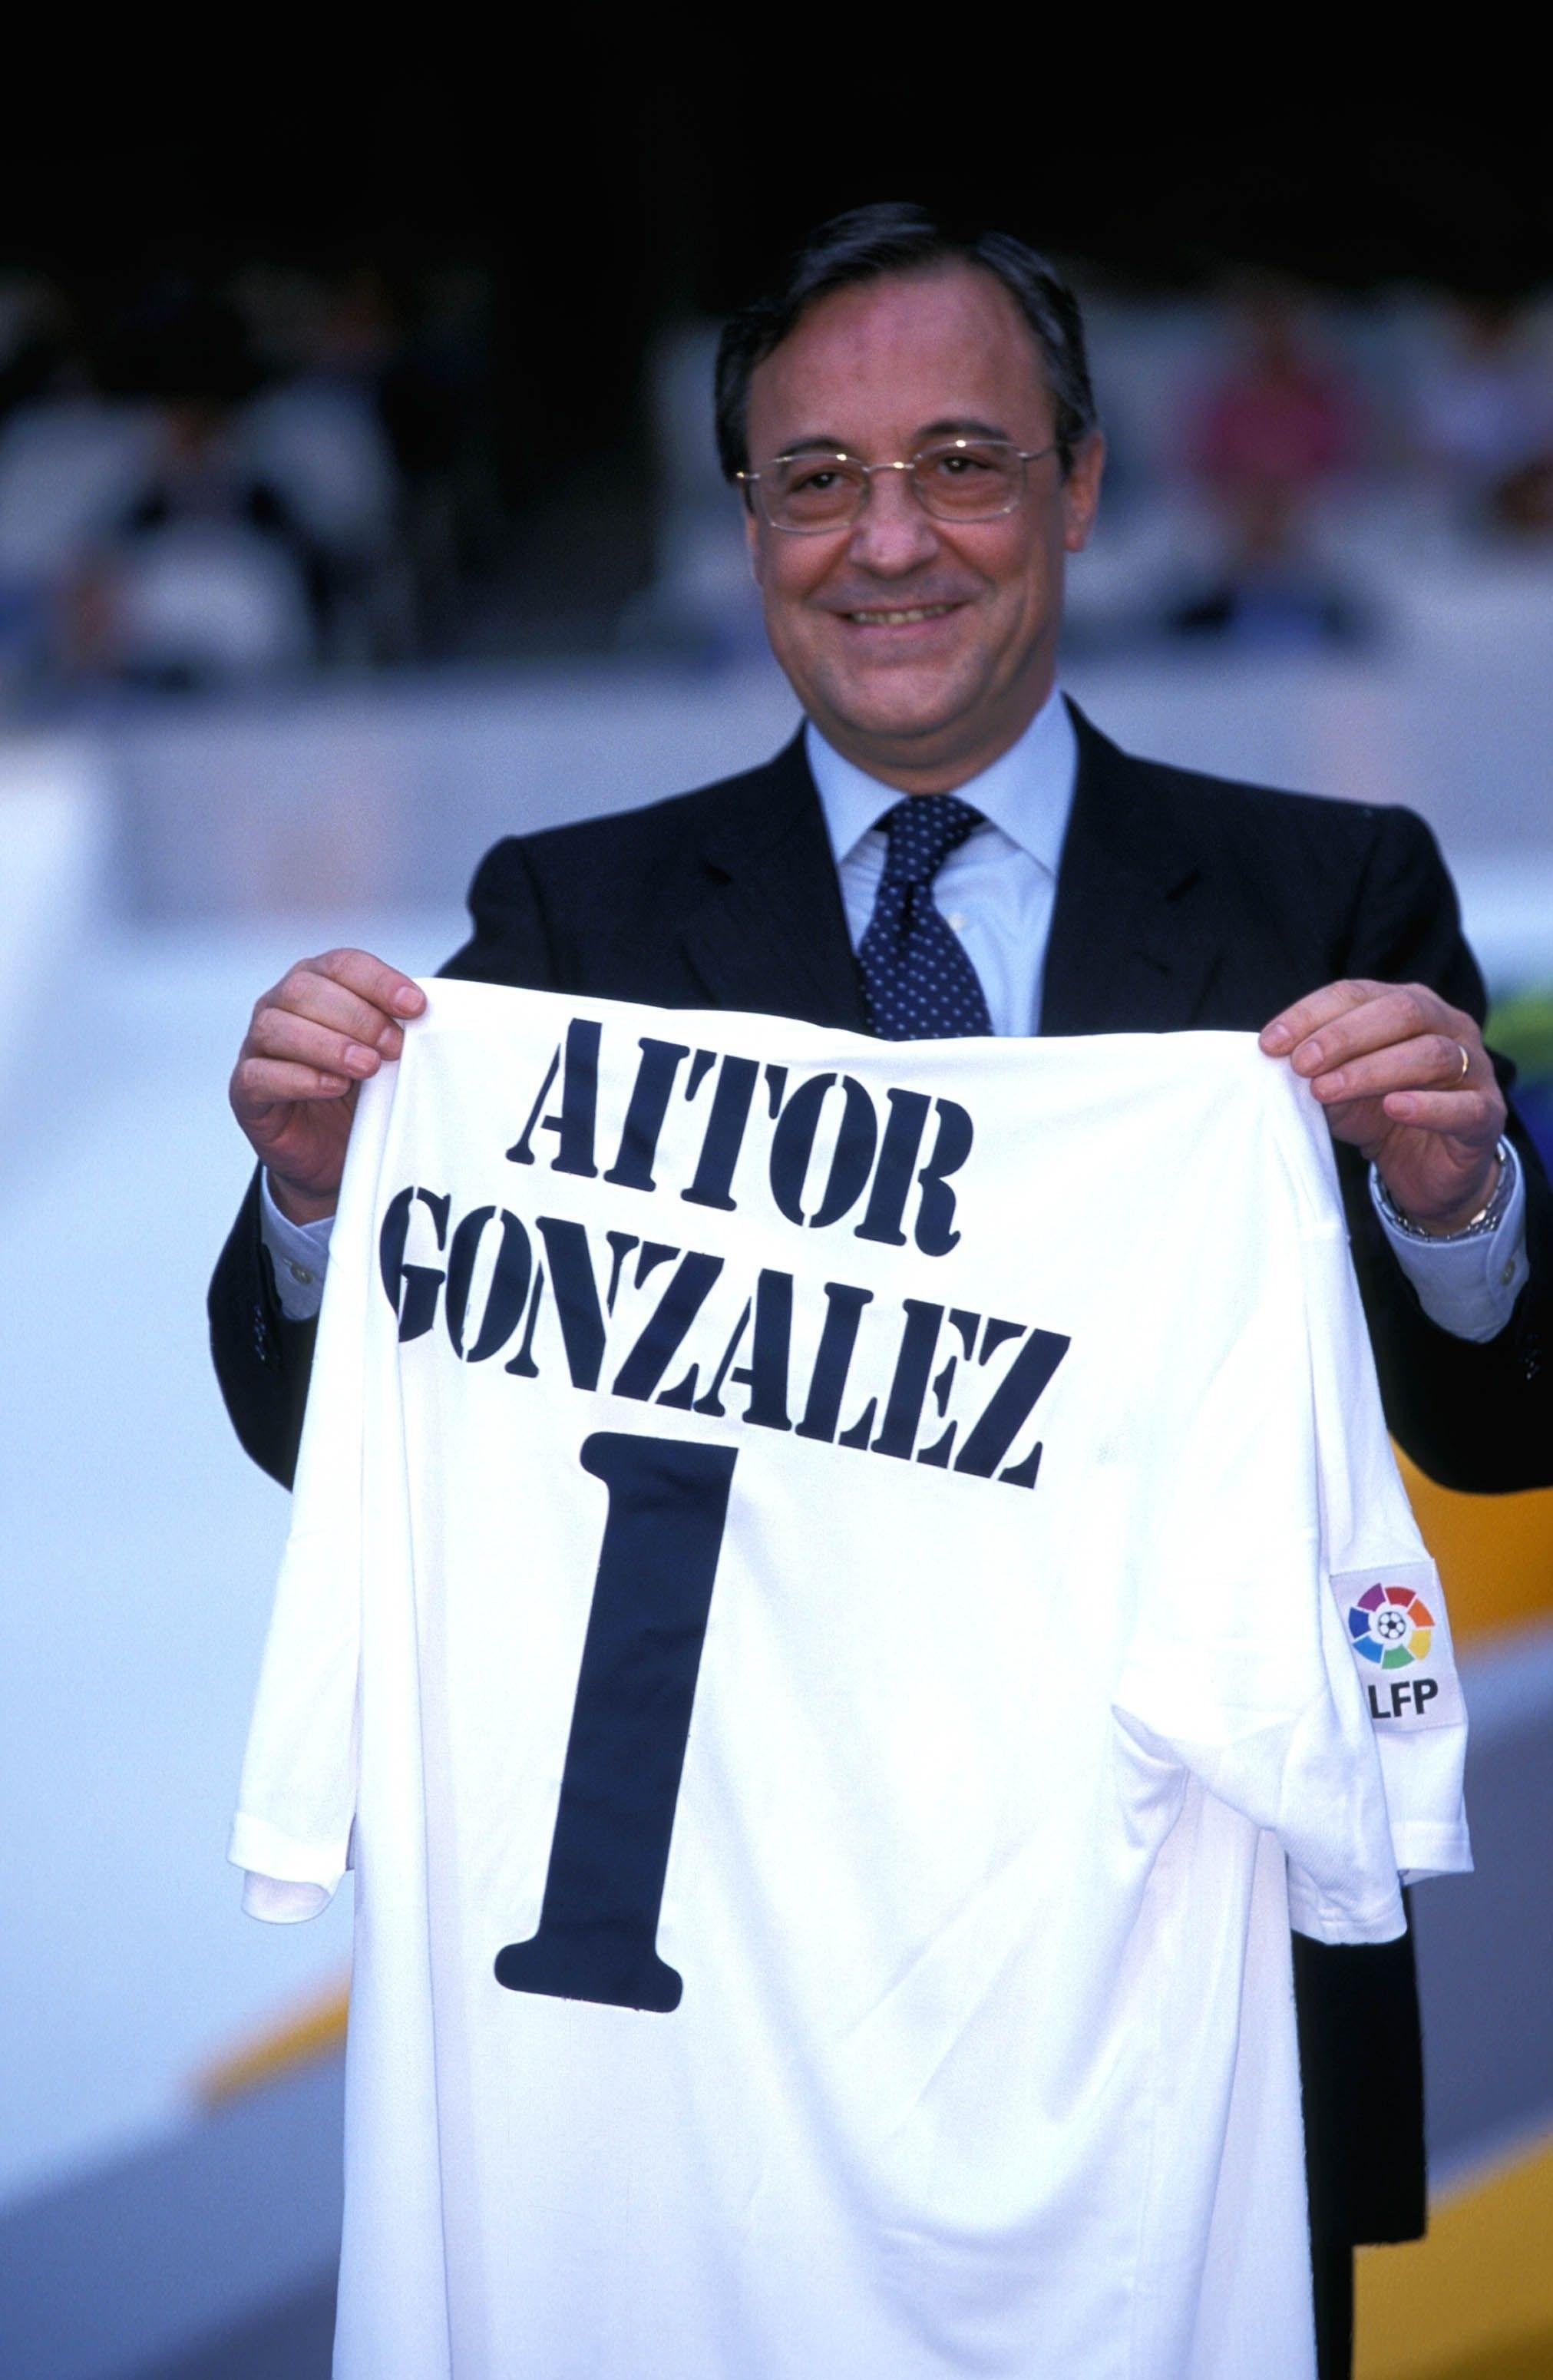 Camiseta de Aitor González, Vuelta España 2002 Bernabéu